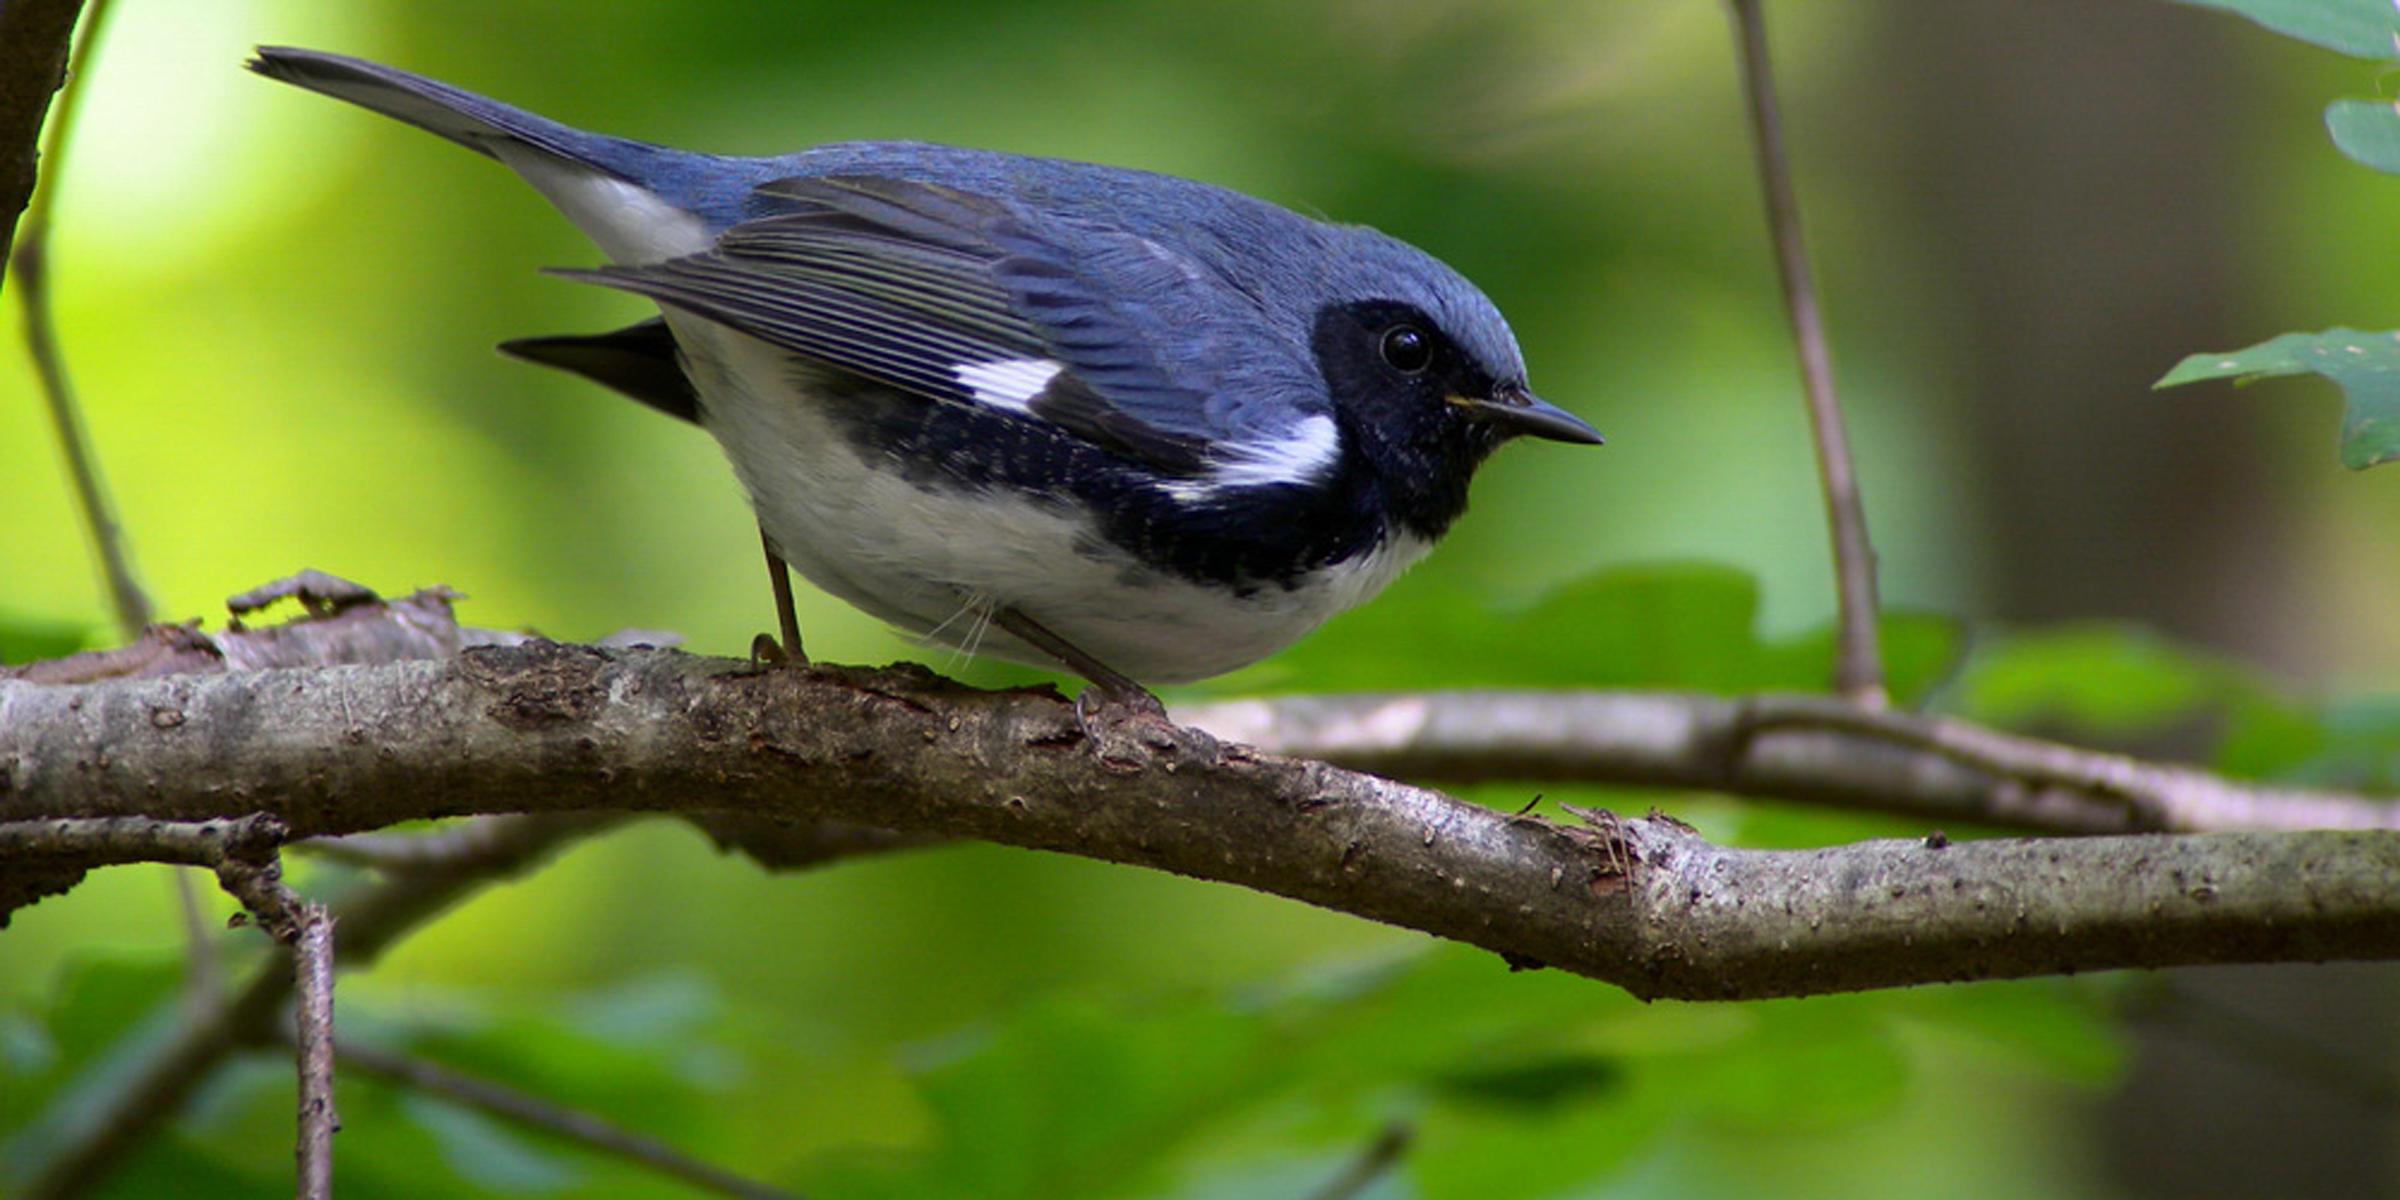 Black-throated Blue Warbler by Megumi Aita